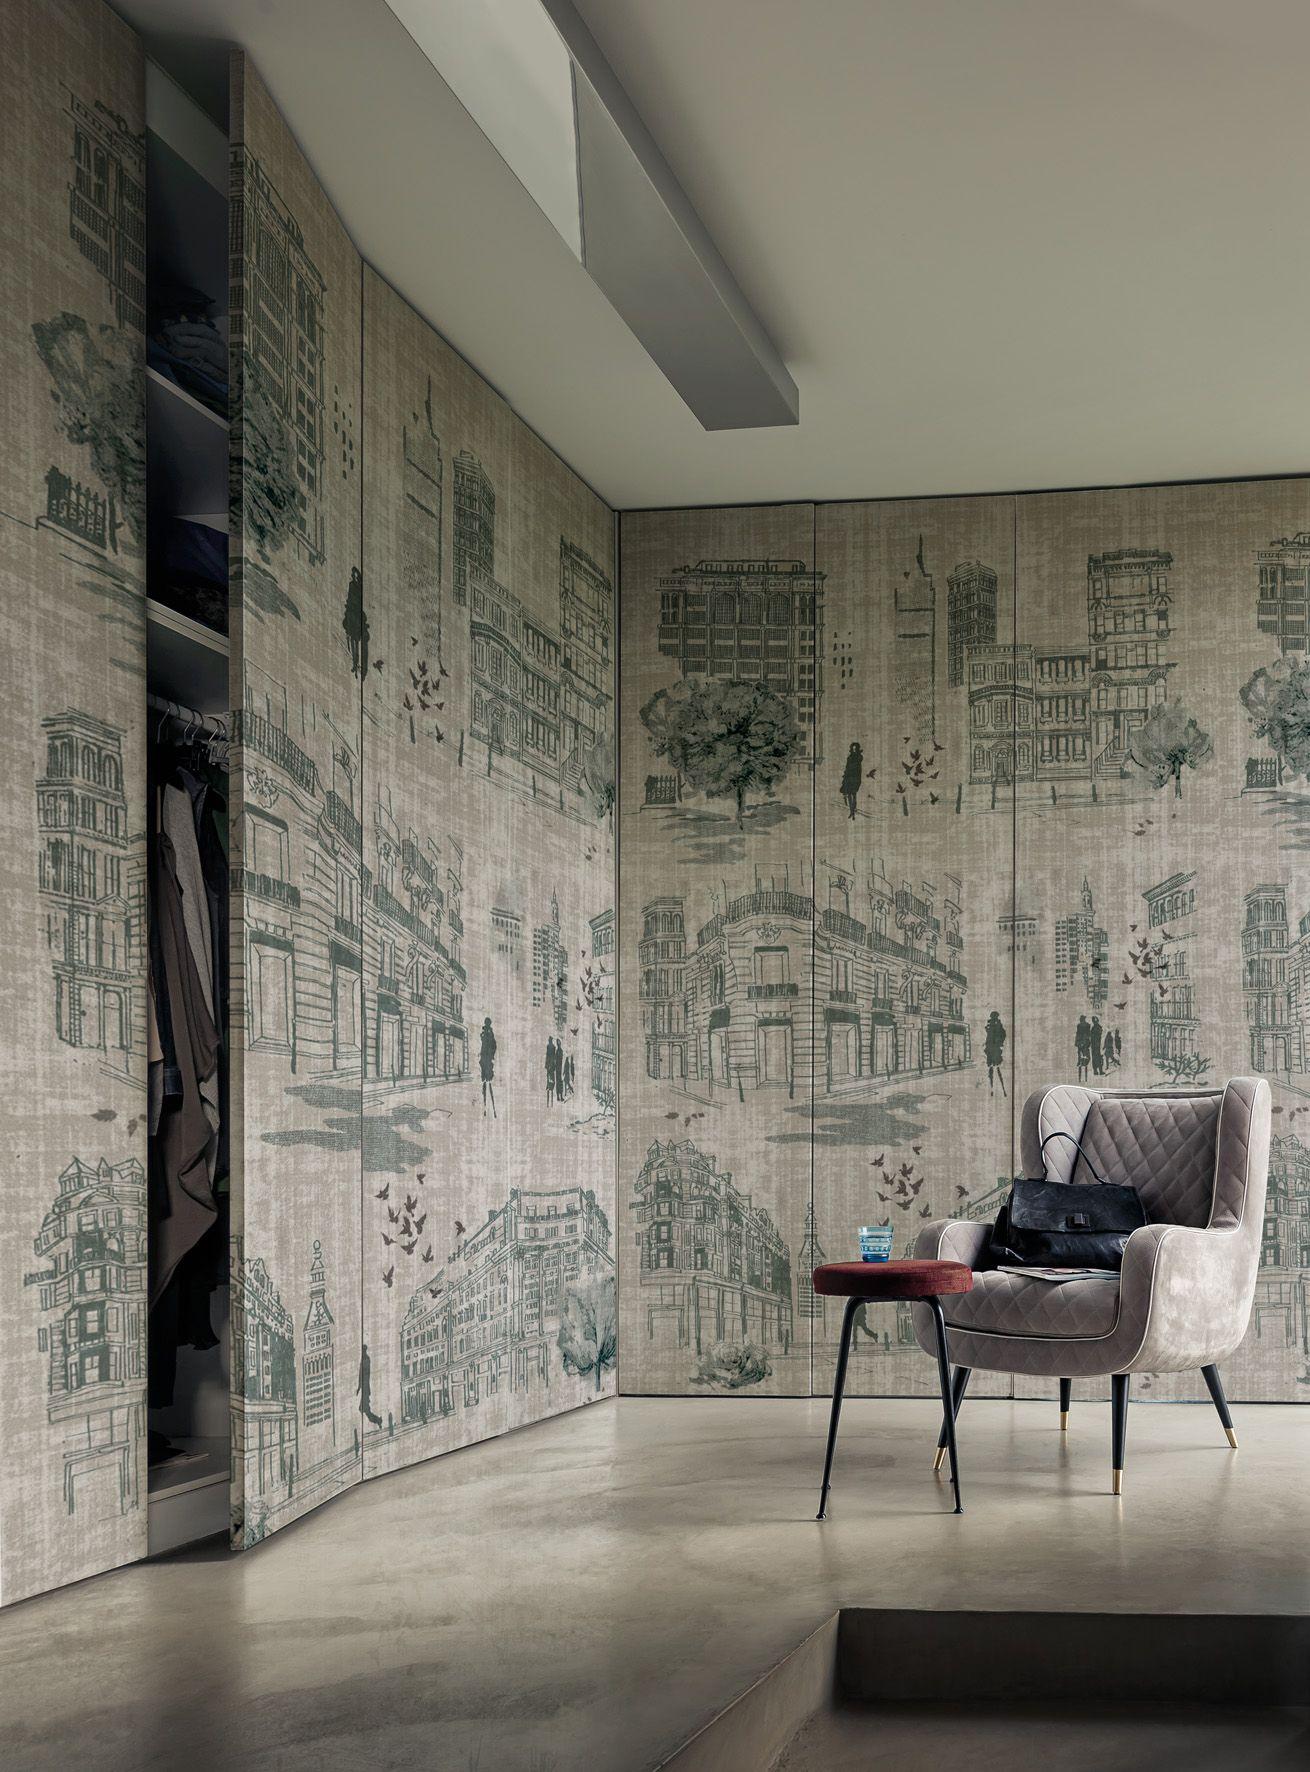 wallpaper times by wall dec design lorenzo de grandis. Black Bedroom Furniture Sets. Home Design Ideas